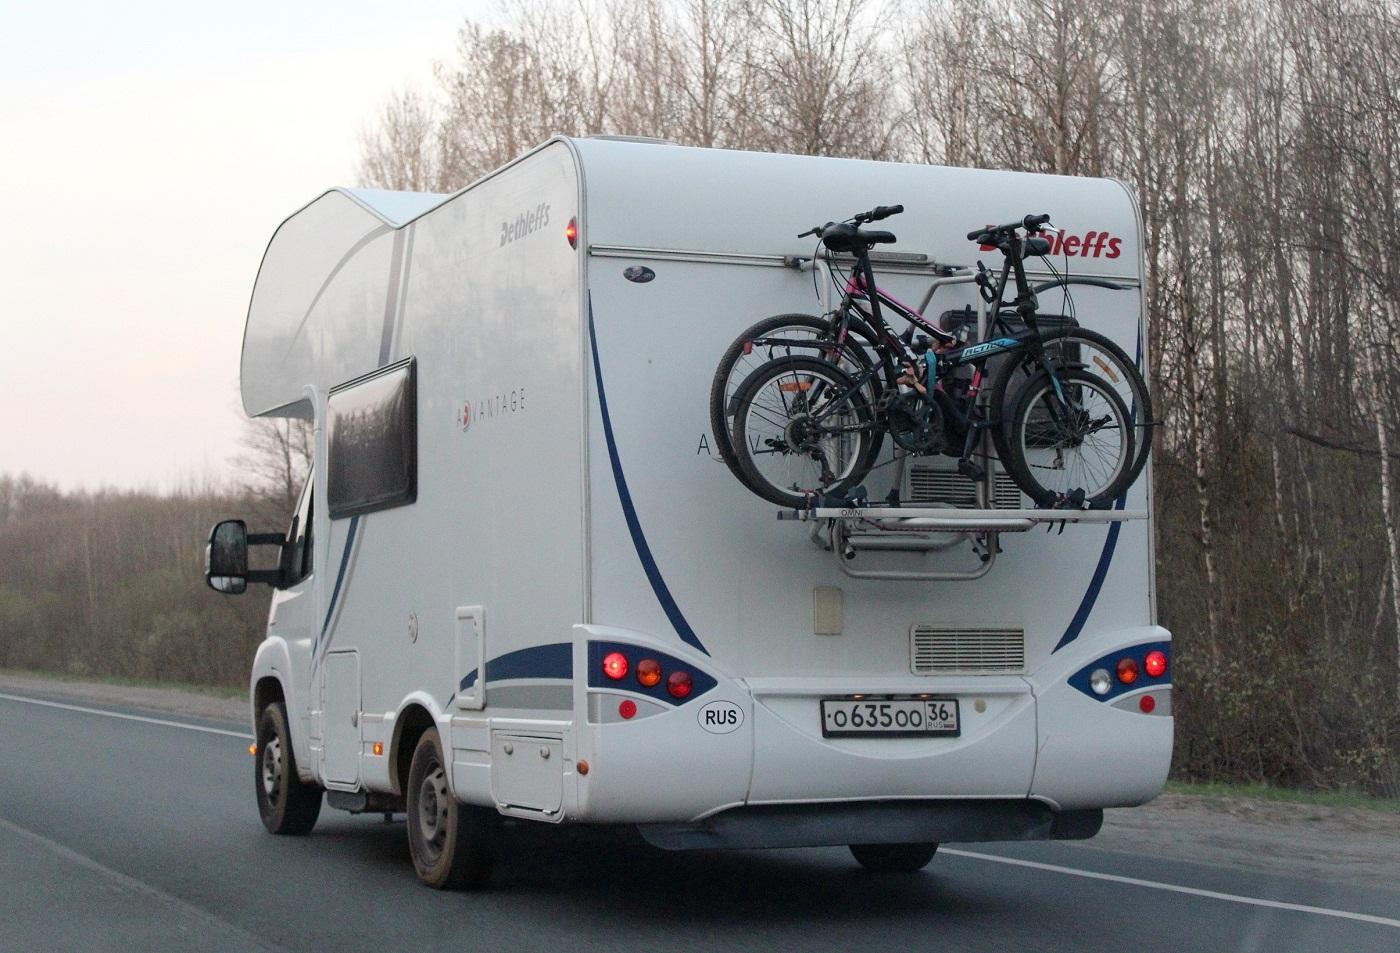 Автодом Dethleffs Advantage A5831 на шасси Fiat Ducato #О 635 ОО 36. Псков, Ленинградское шоссе